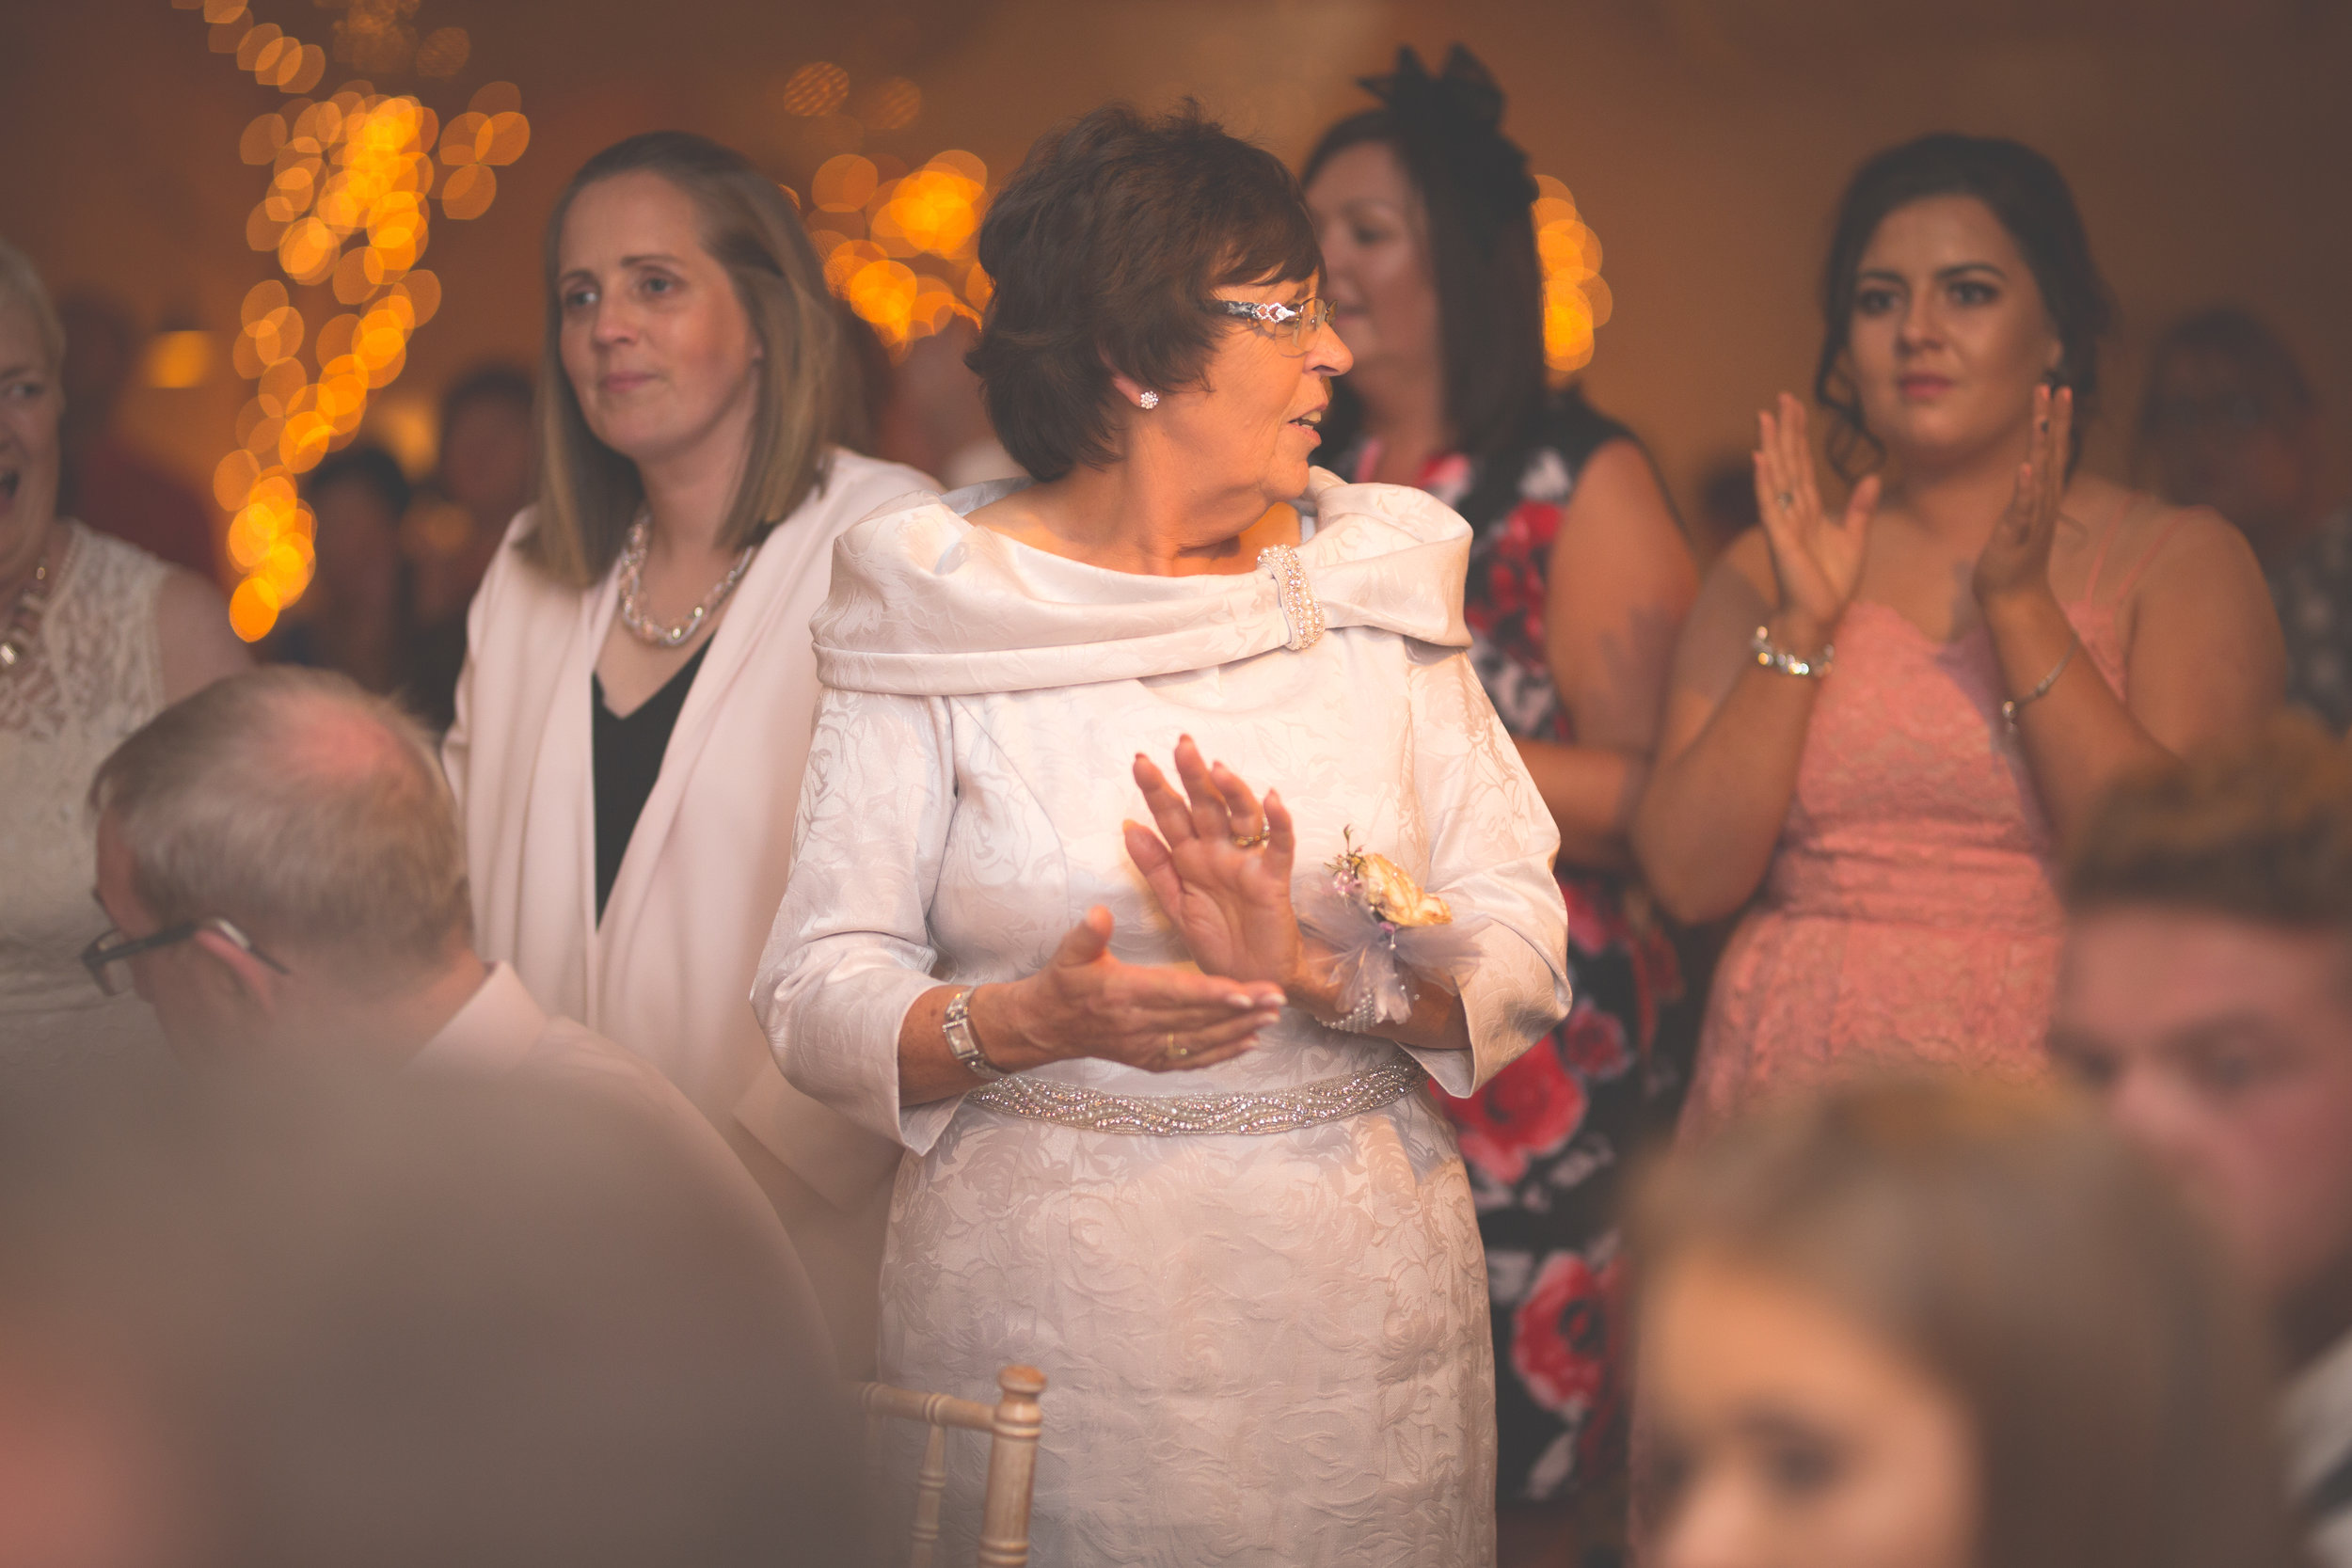 Brian McEwan Wedding Photography | Carol-Annee & Sean | The Dancing-8.jpg